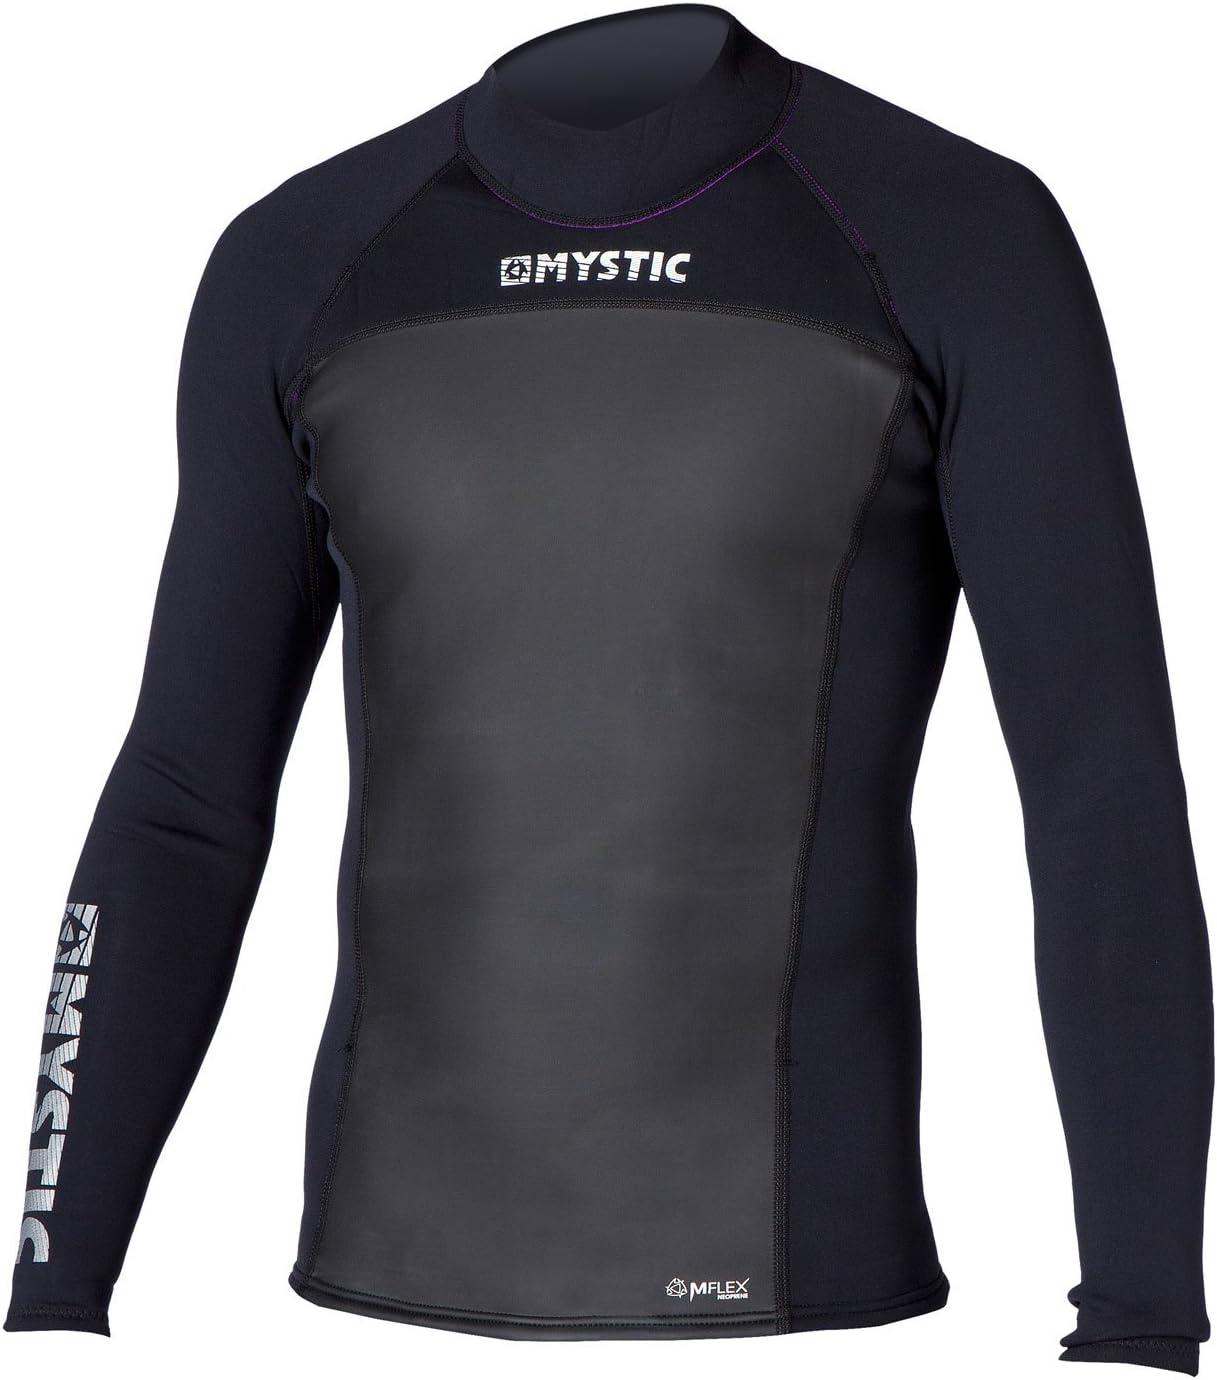 Mystic 2018 Star 2mm Neoprene Long Sleeve Top Black 140255